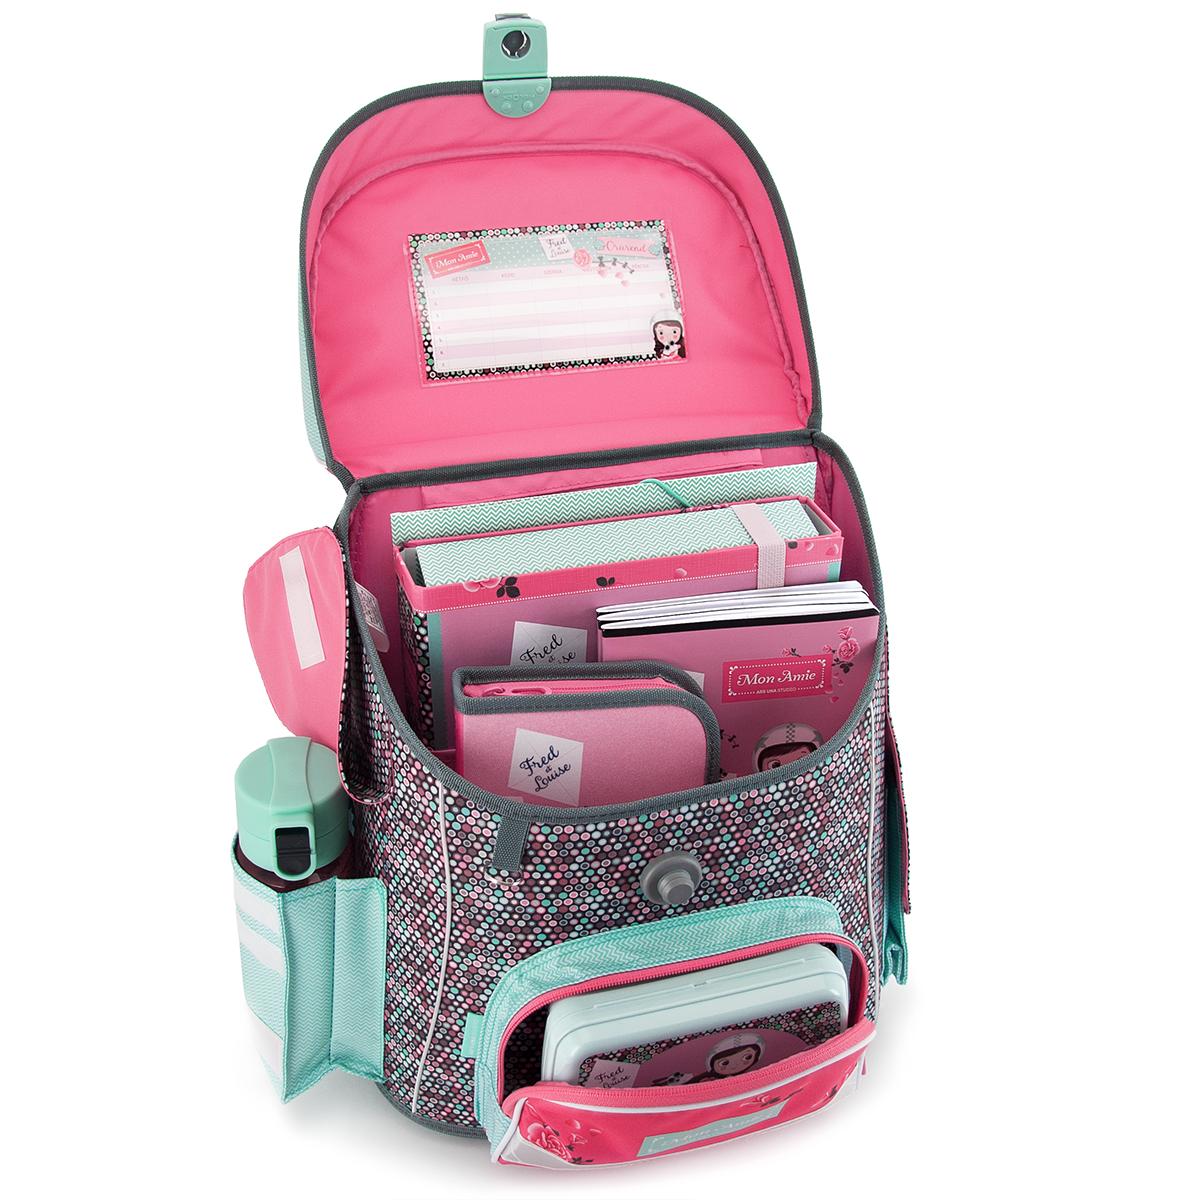 4b066487203e Ars Una Mon Amie schoolbag with magnetic lock